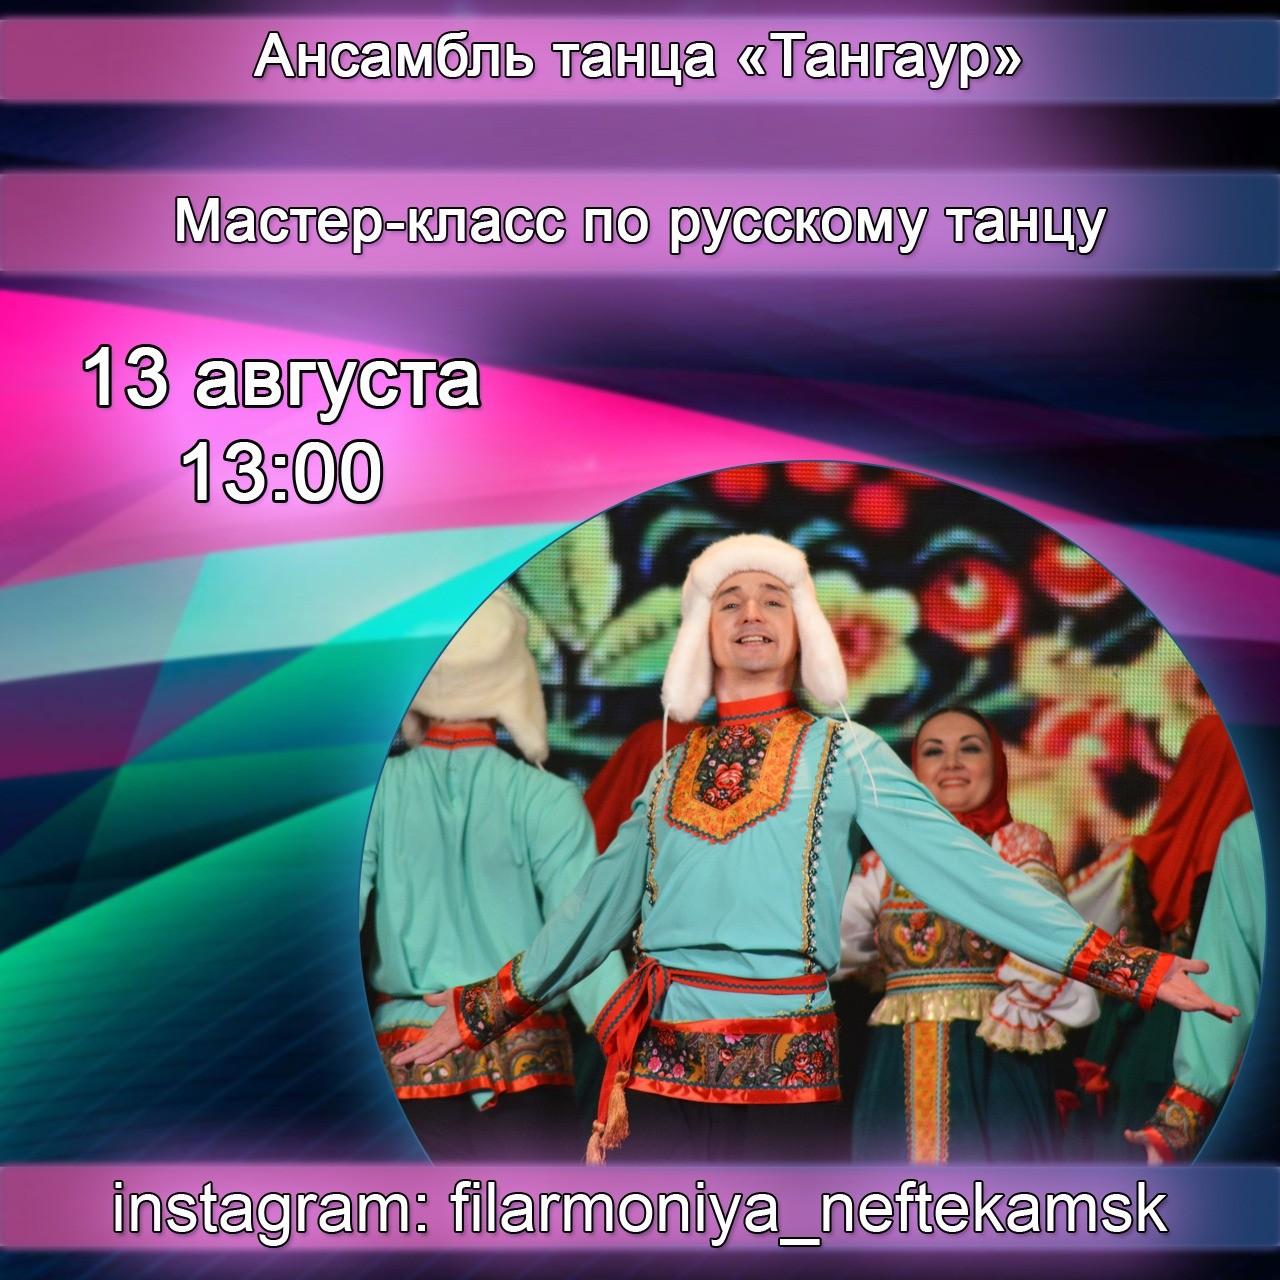 Мастер-класс по русскому танцу